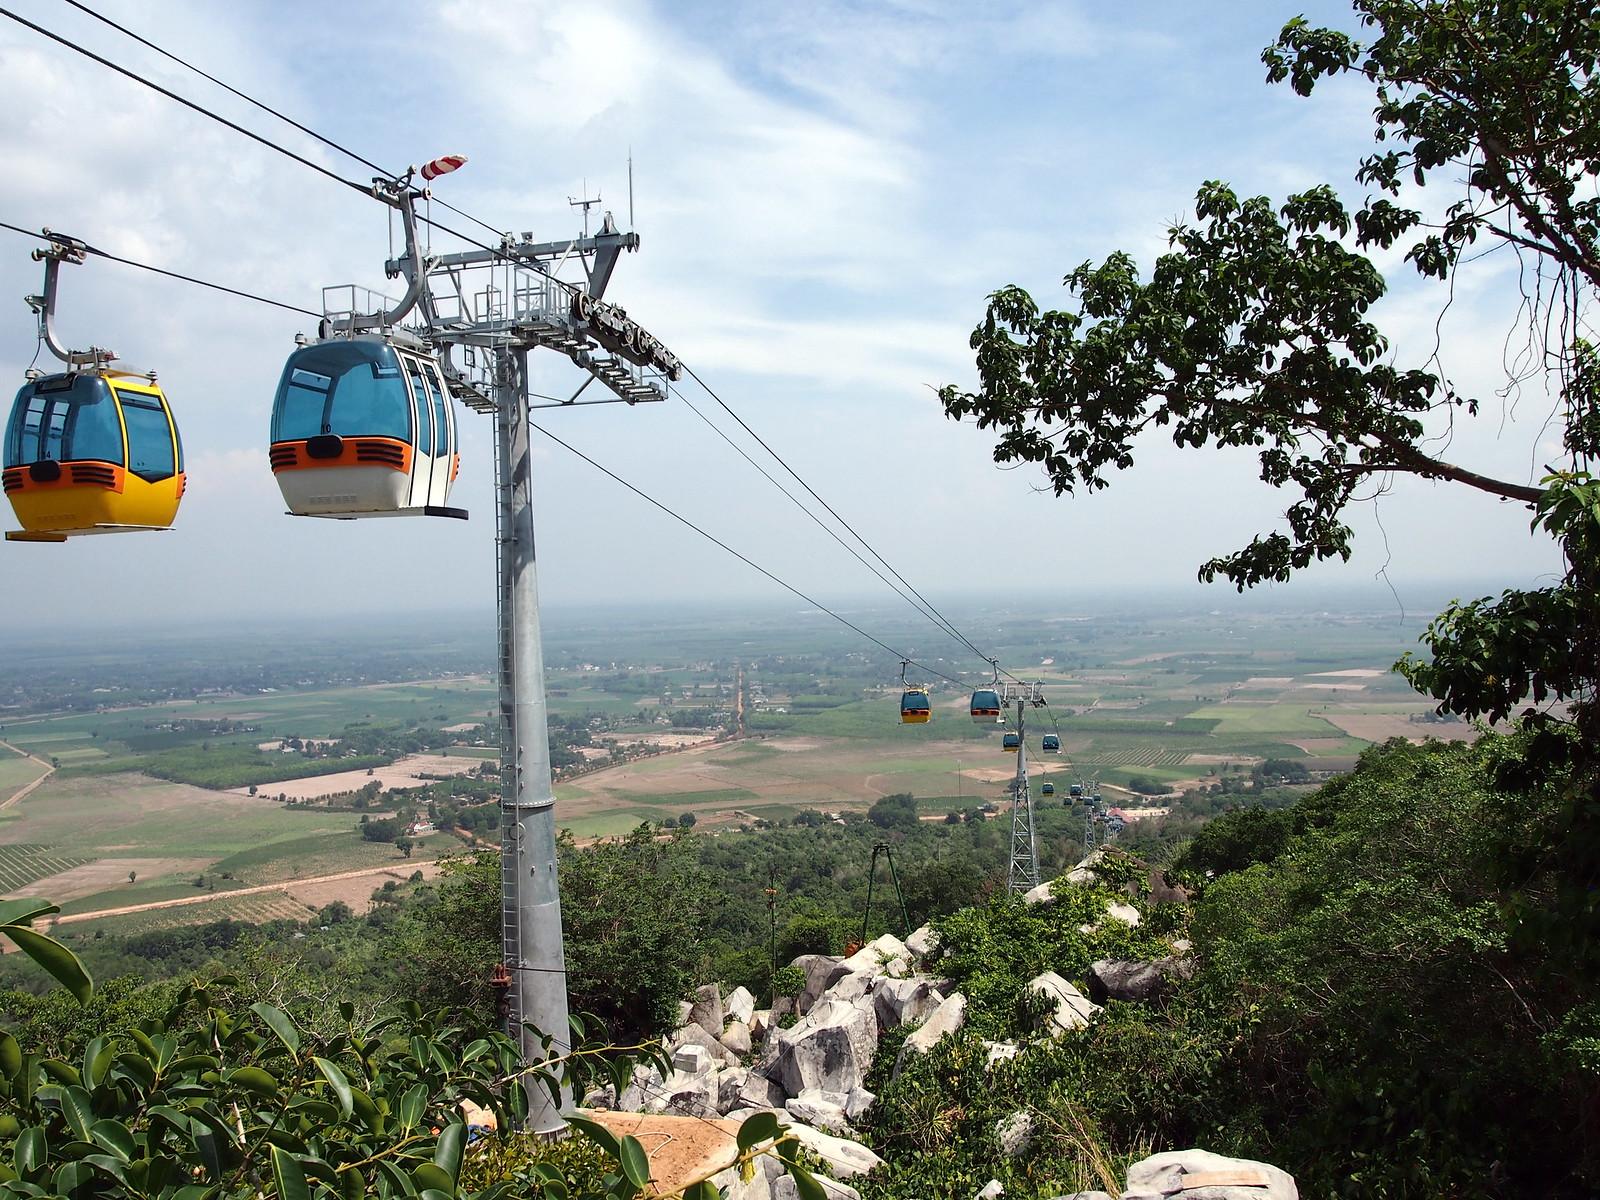 Black Virgin Mountain Cable Car in Tay Ninh City, Vietnam